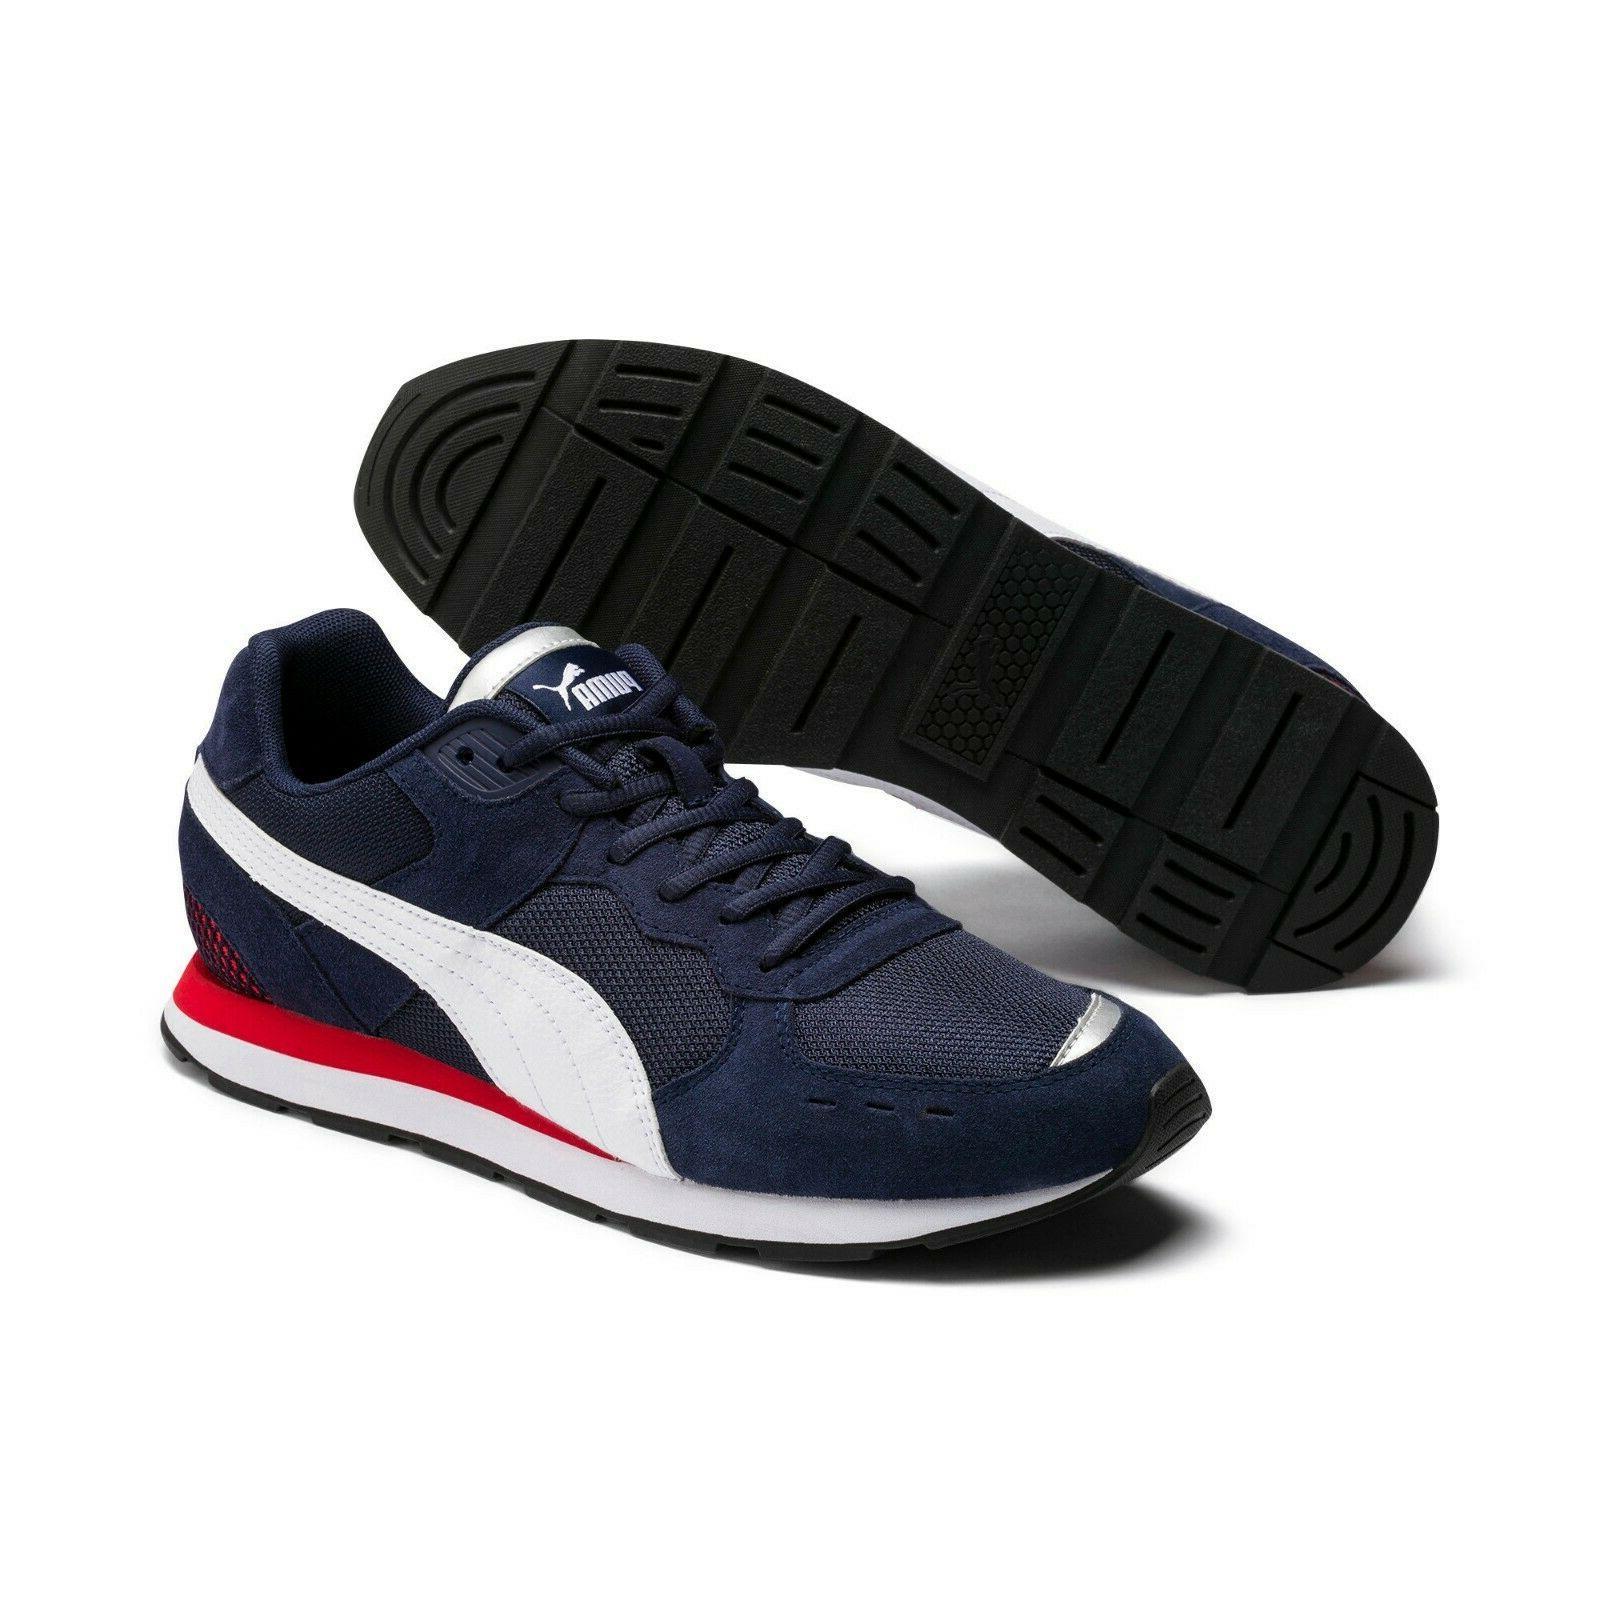 Puma Vista Sneakers 11 New